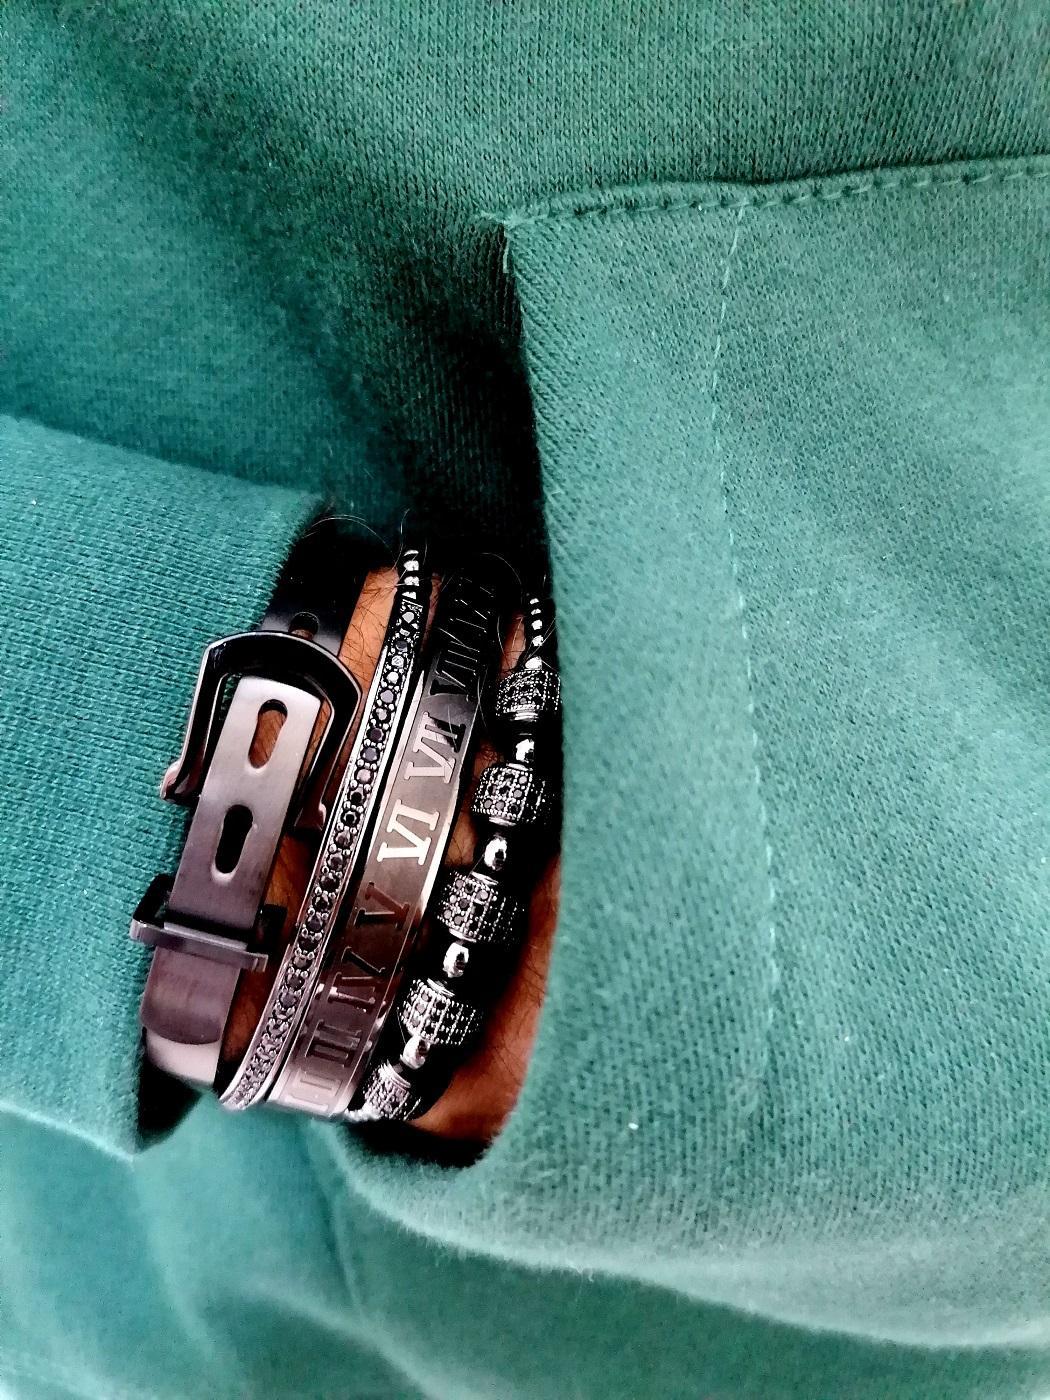 New York Black Crown Bracelet, Black Leather Bracelet, Mens Black Leather Bracelet, Black Diamond Tennis Bracelet, Mens Black Bead Bracelet, Black Wristband,Mens Stacked Bracelets Amazon New York